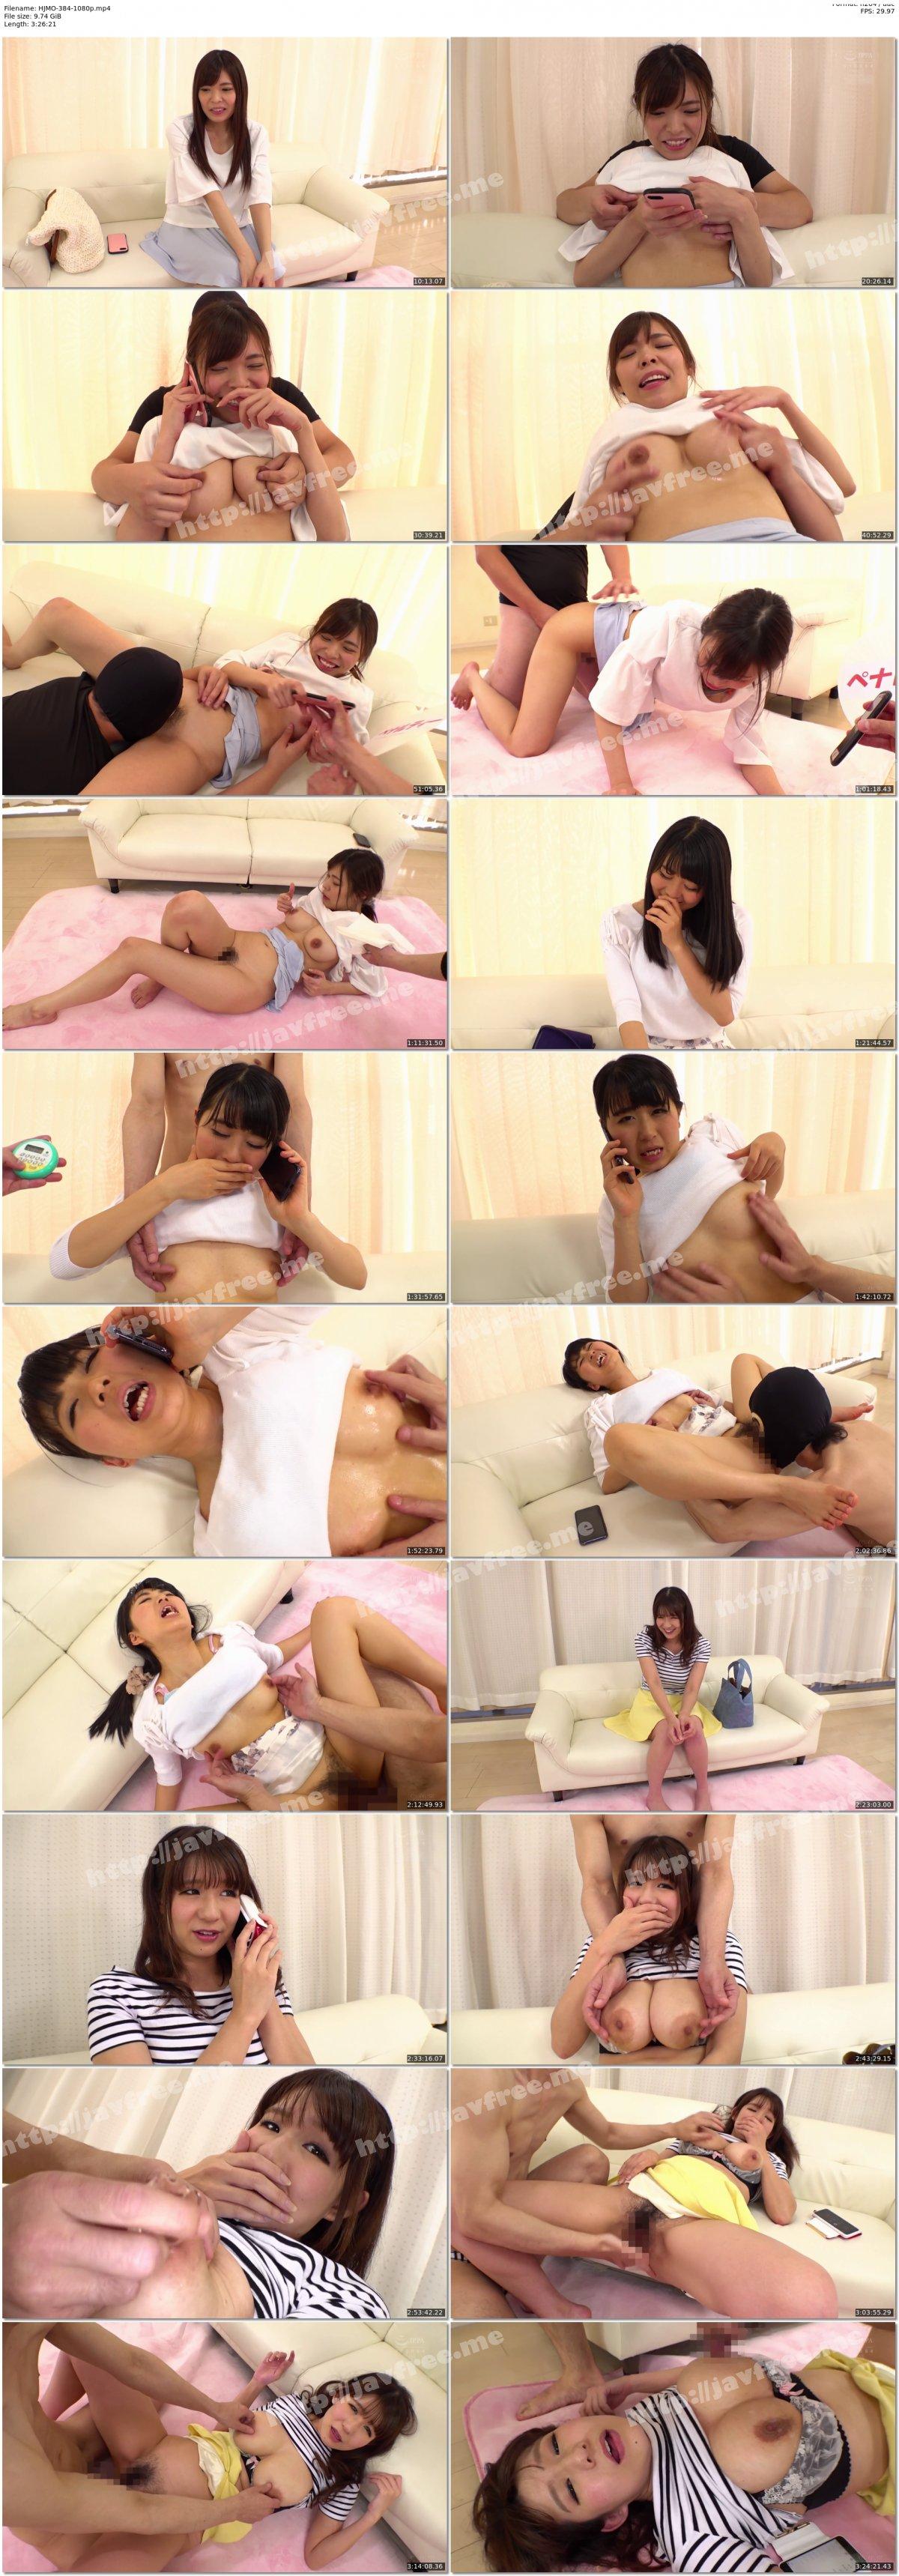 [HD][HJMO-384] 寝取られTELショッキング 彼氏と電話中ず~っと乳首責め耐えたら賞金30万バレたら乳首コリコリSEX3